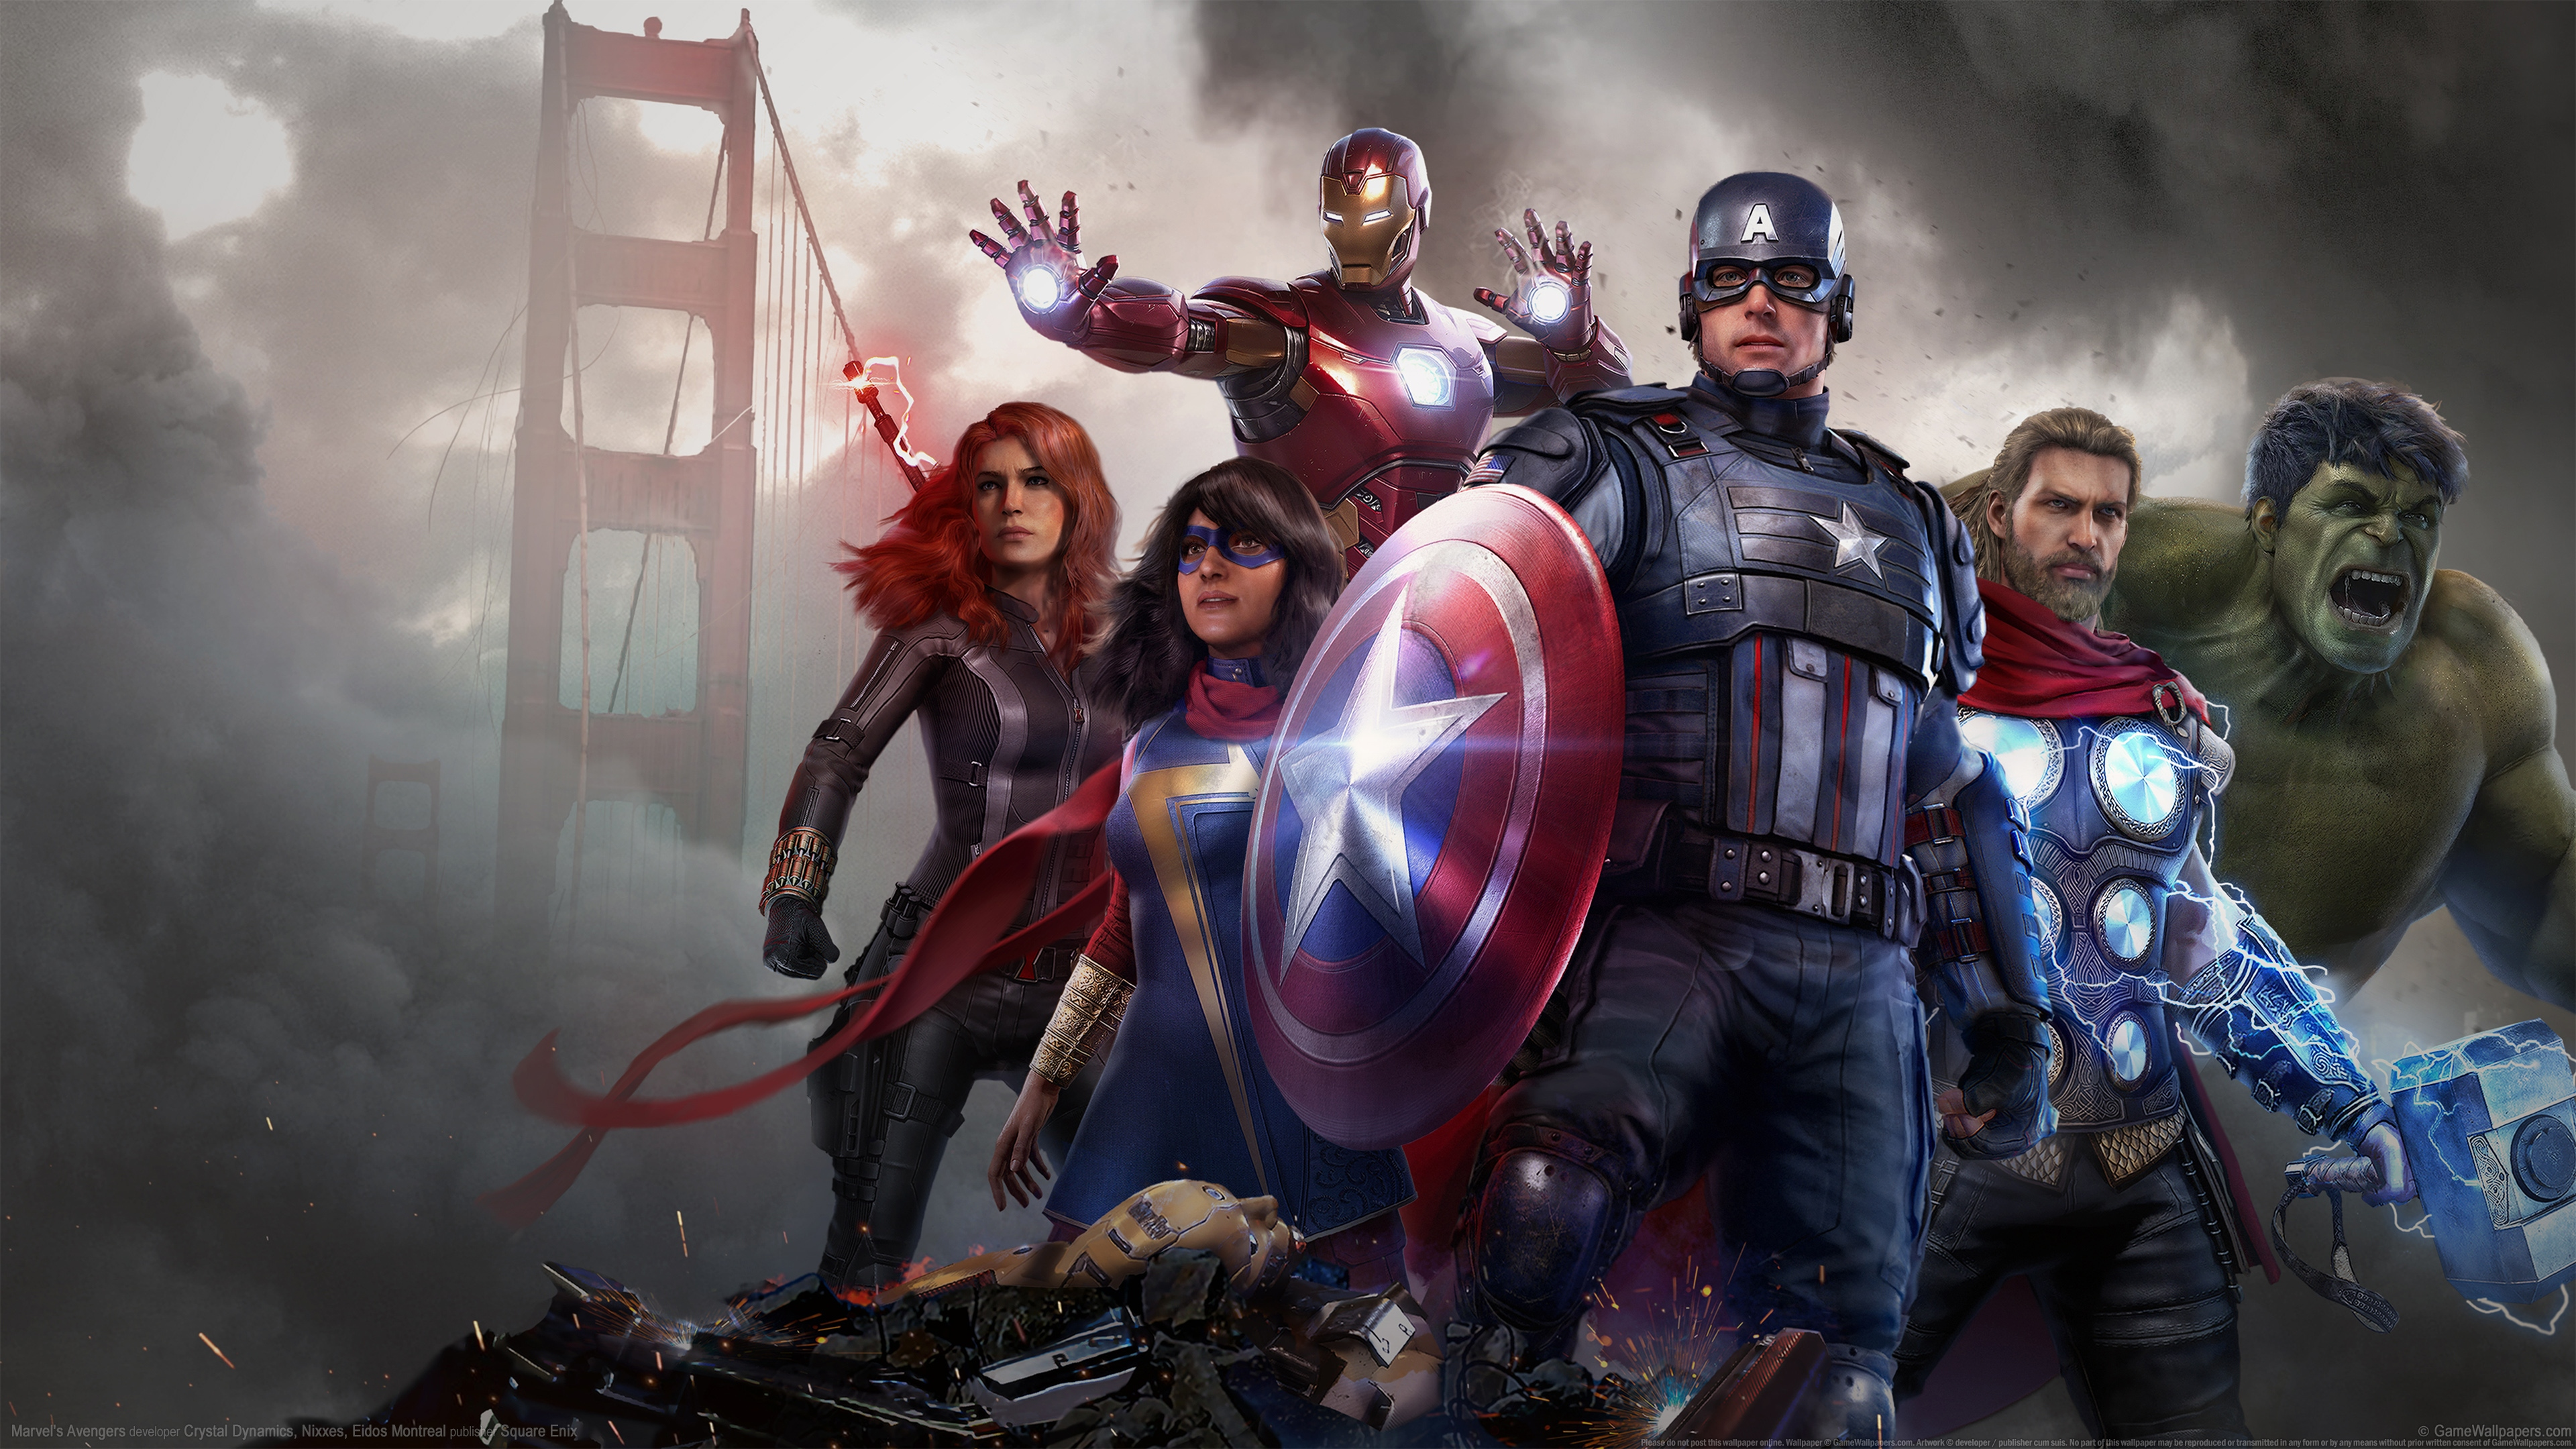 General 3840x2160 Marvel's Avengers video games video game art digital art Hulk Captain America Black Widow Iron Man Thor bridge Ms. Marvel